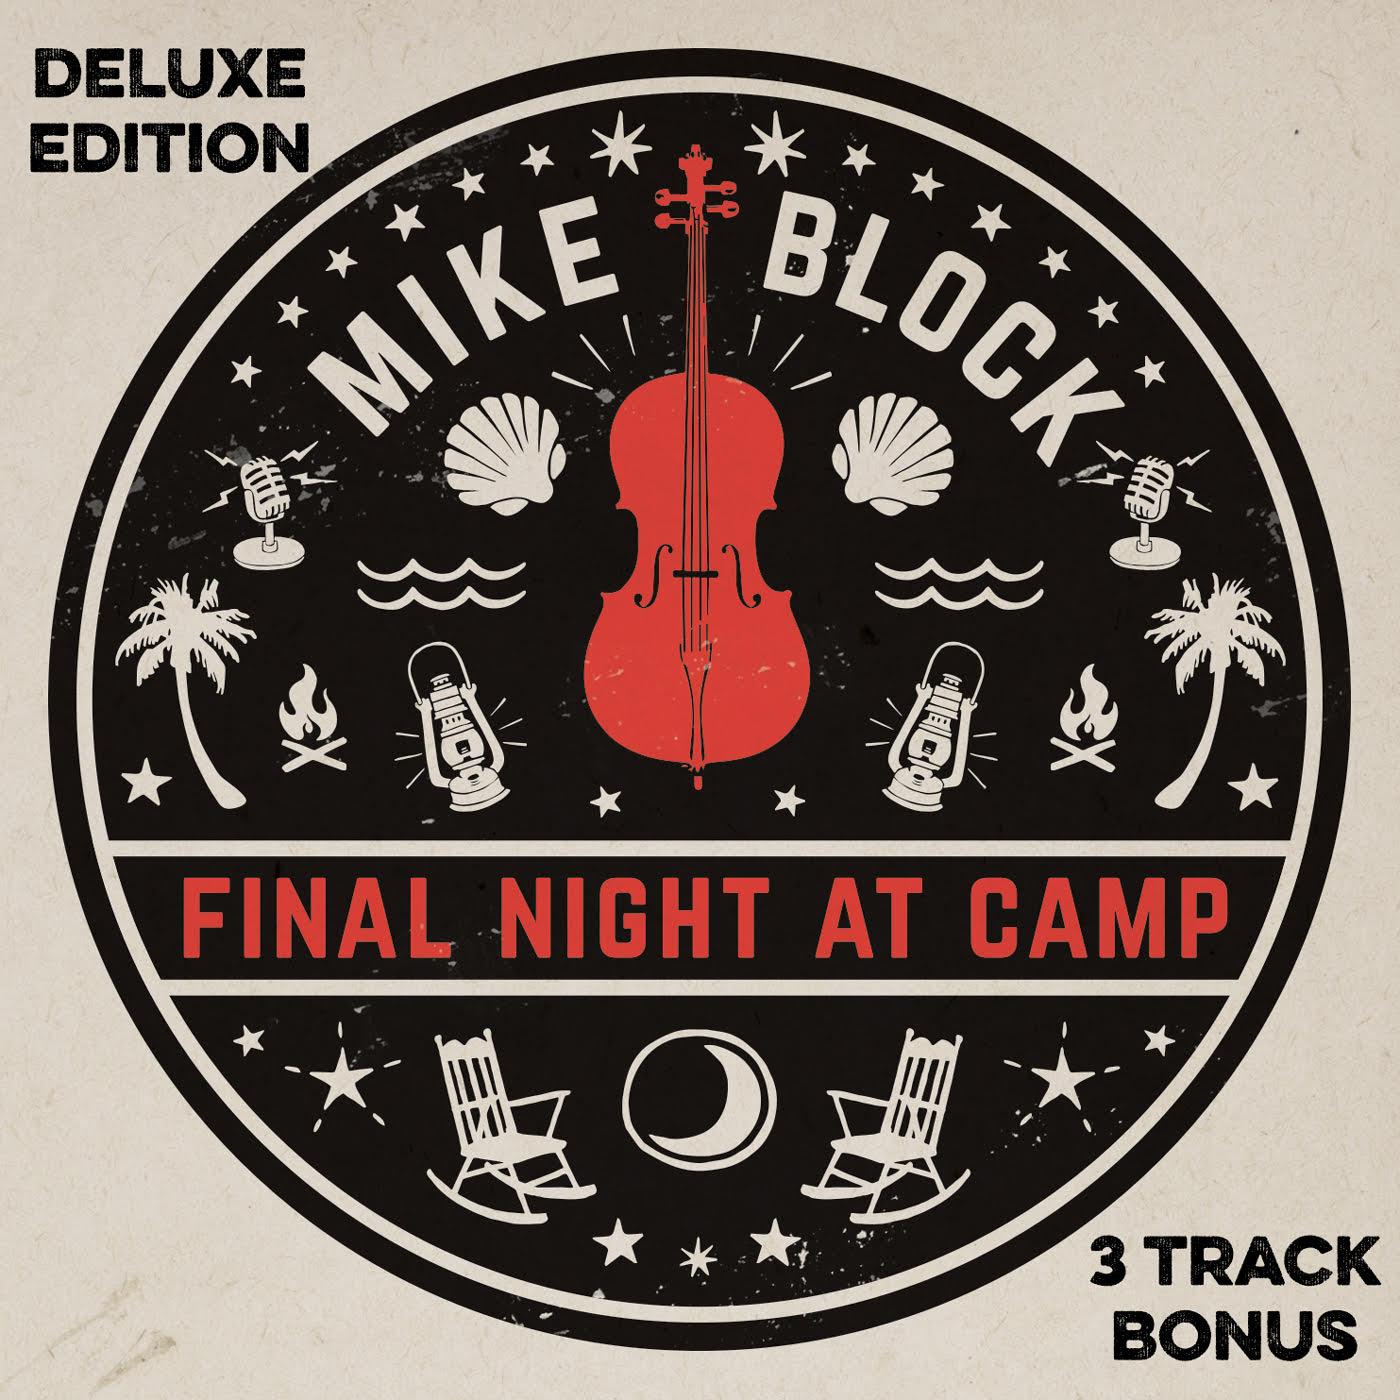 Mike Block, 'Final Night at Camp'